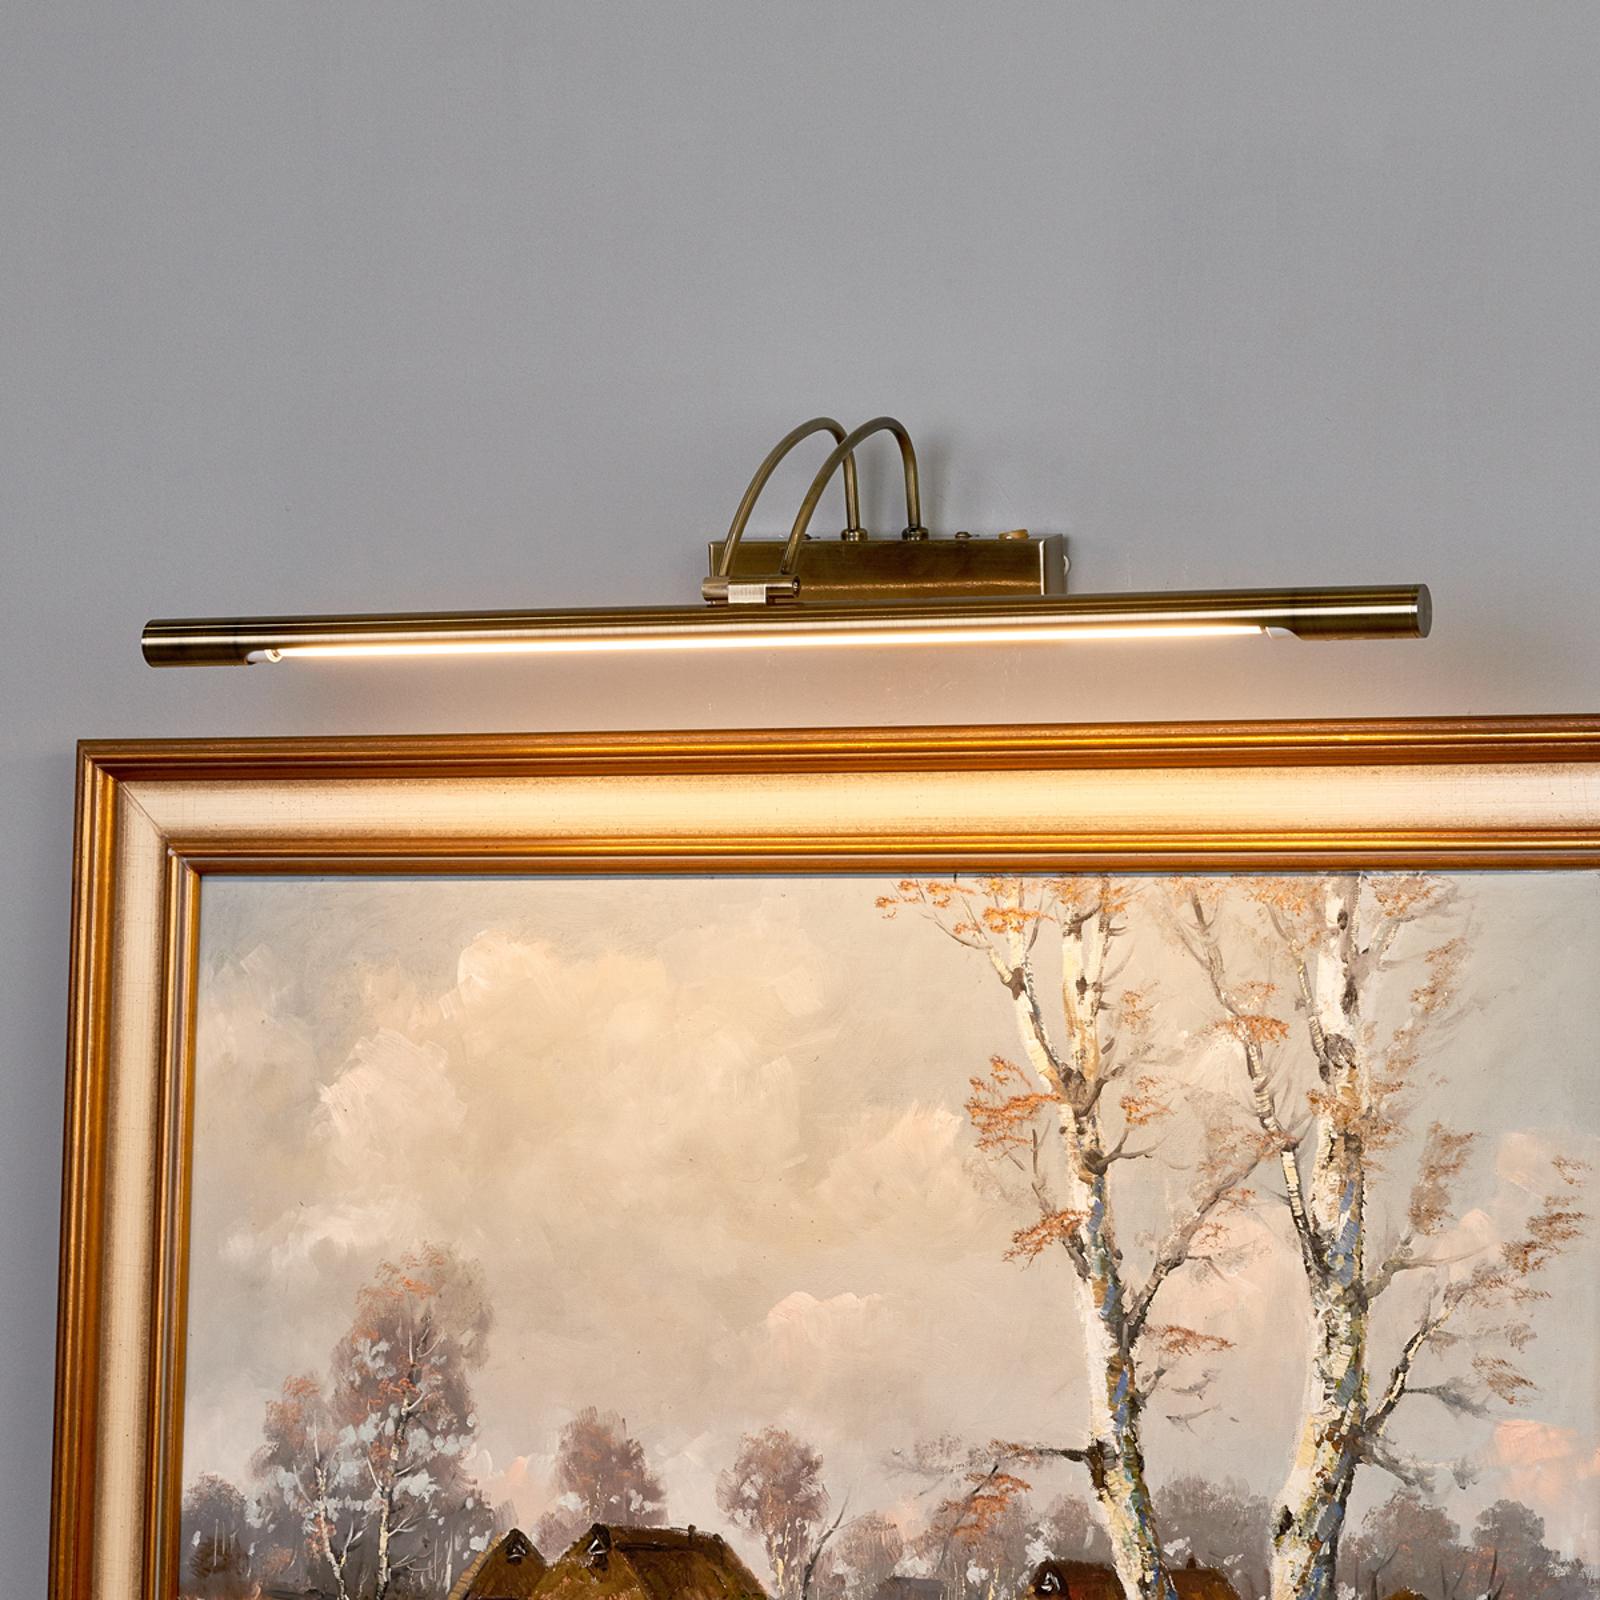 LED-tavelbelysning Piktura, antikmässing